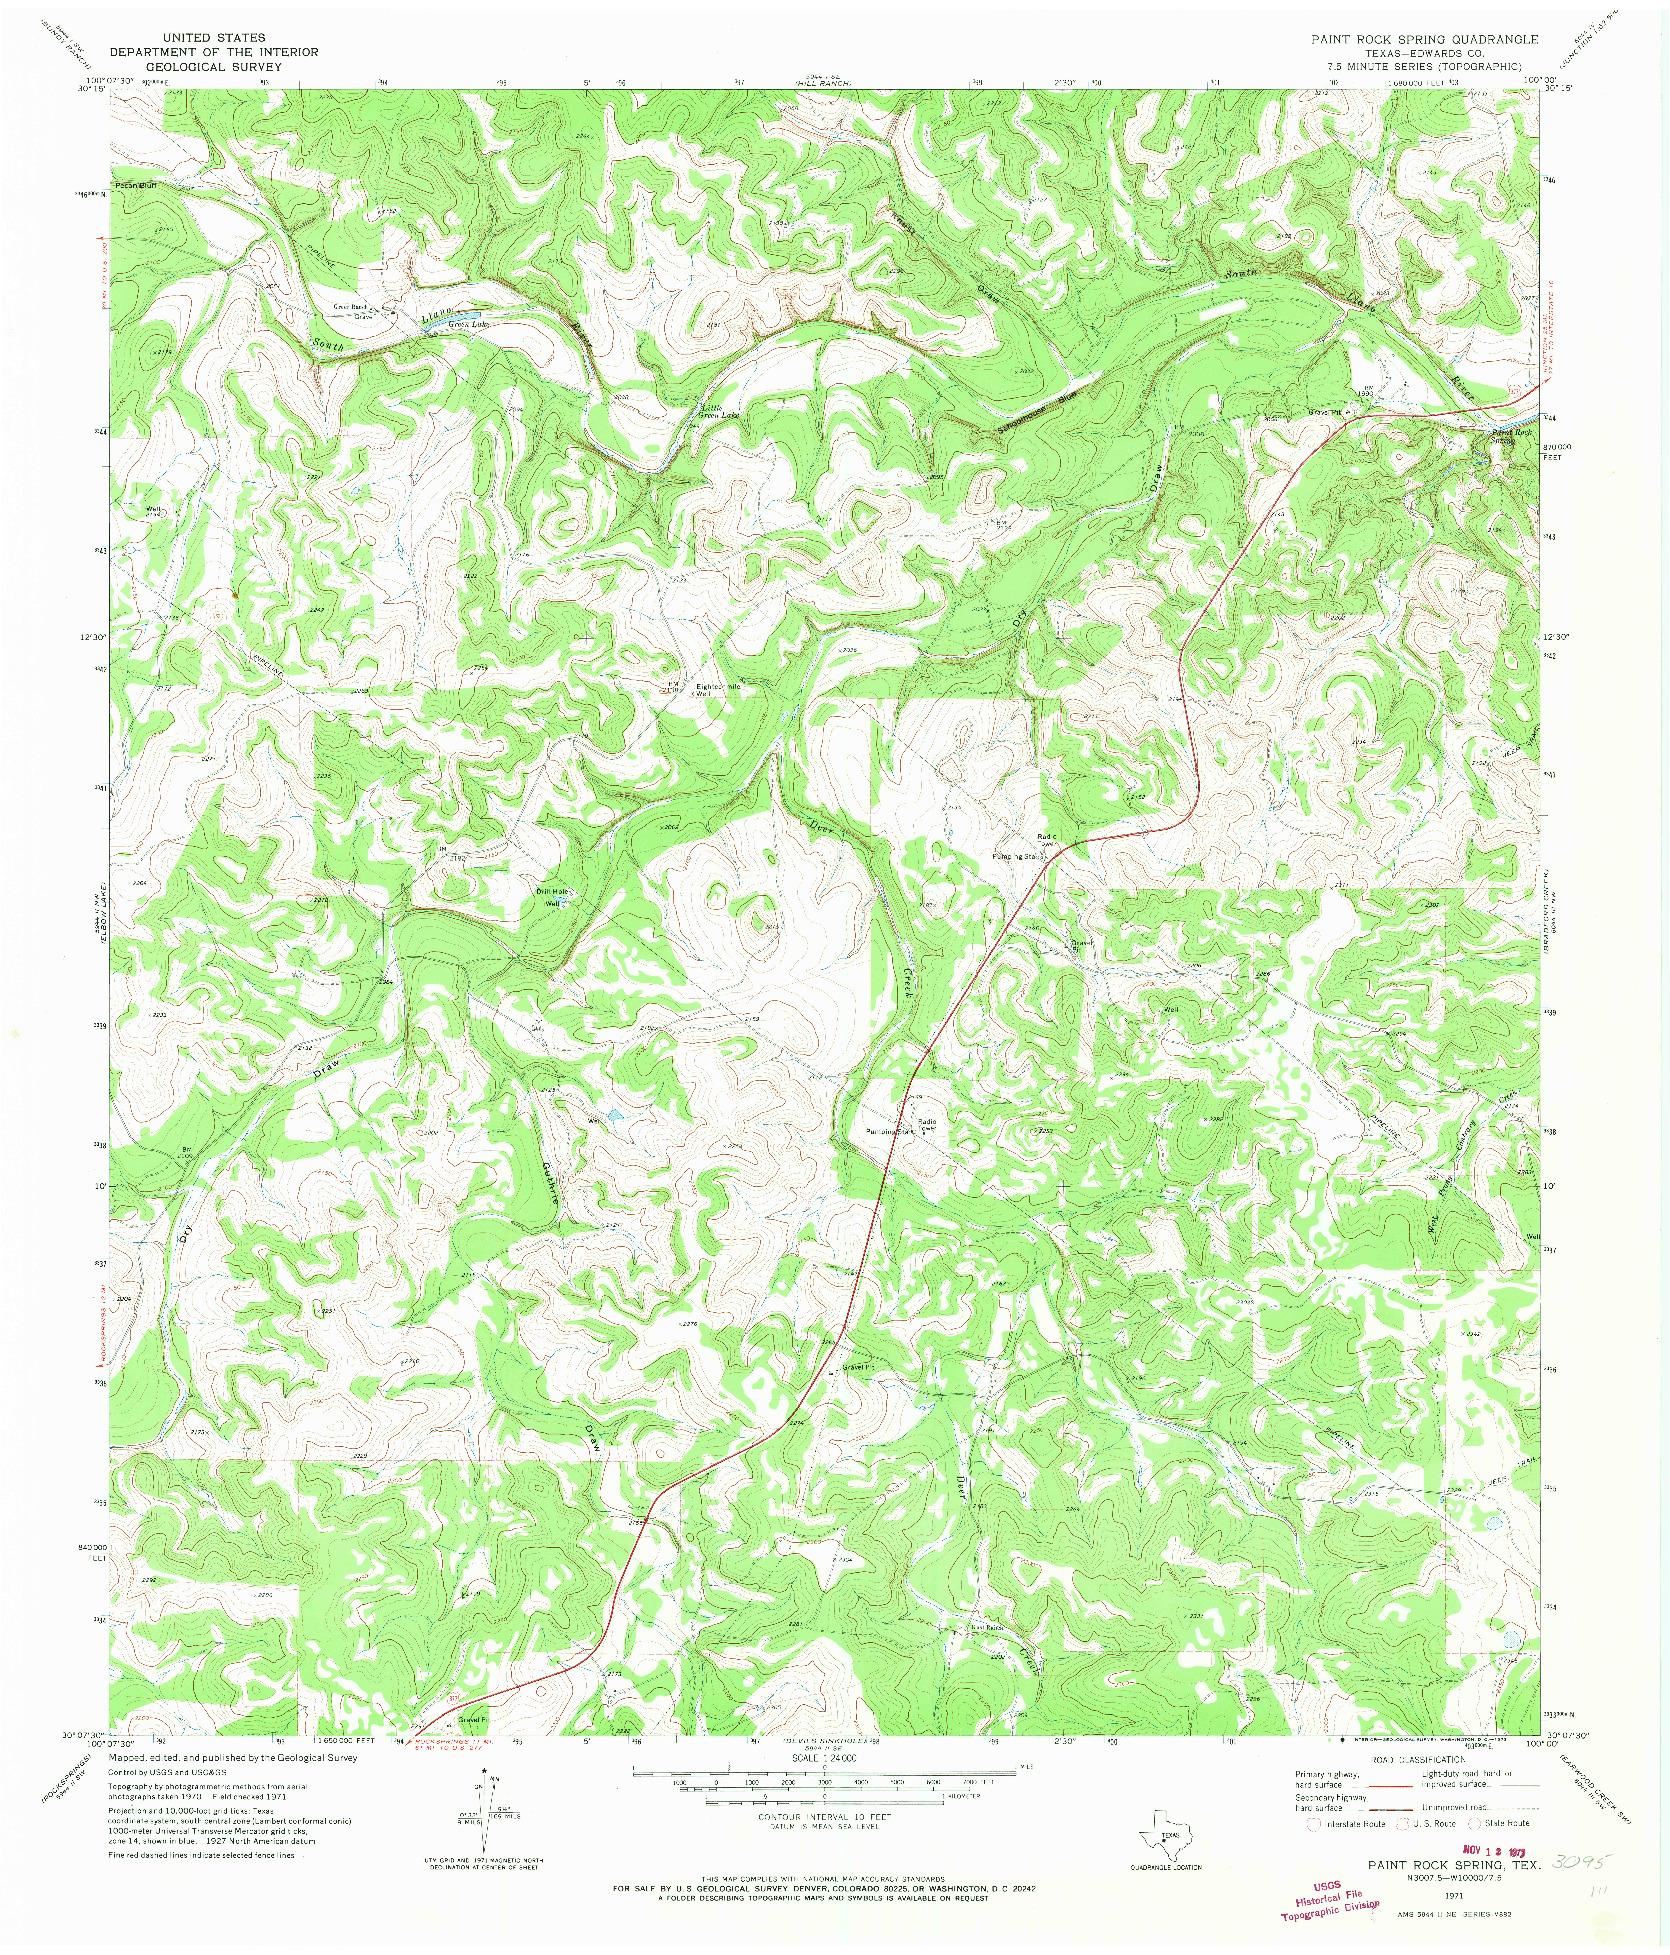 USGS 1:24000-SCALE QUADRANGLE FOR PAINT ROCK SPRING, TX 1971